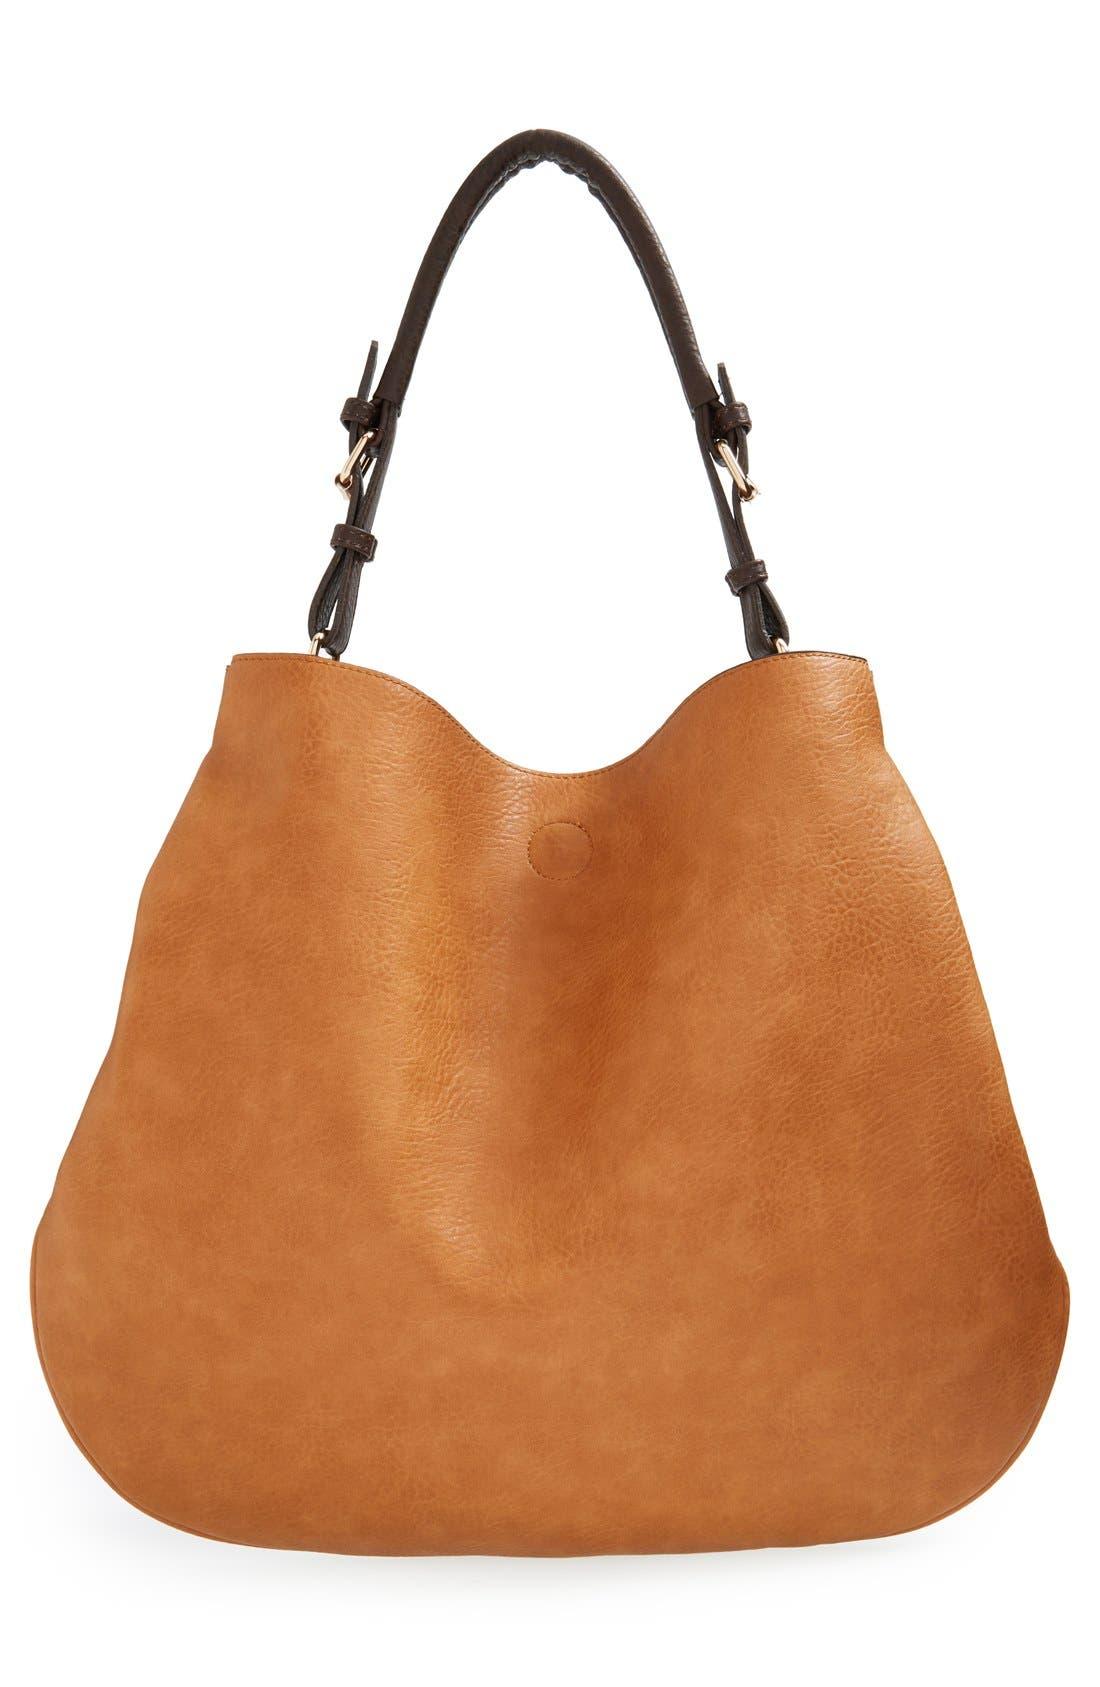 Alternate Image 3  - Sole Society 'Capri' Faux Leather Tote